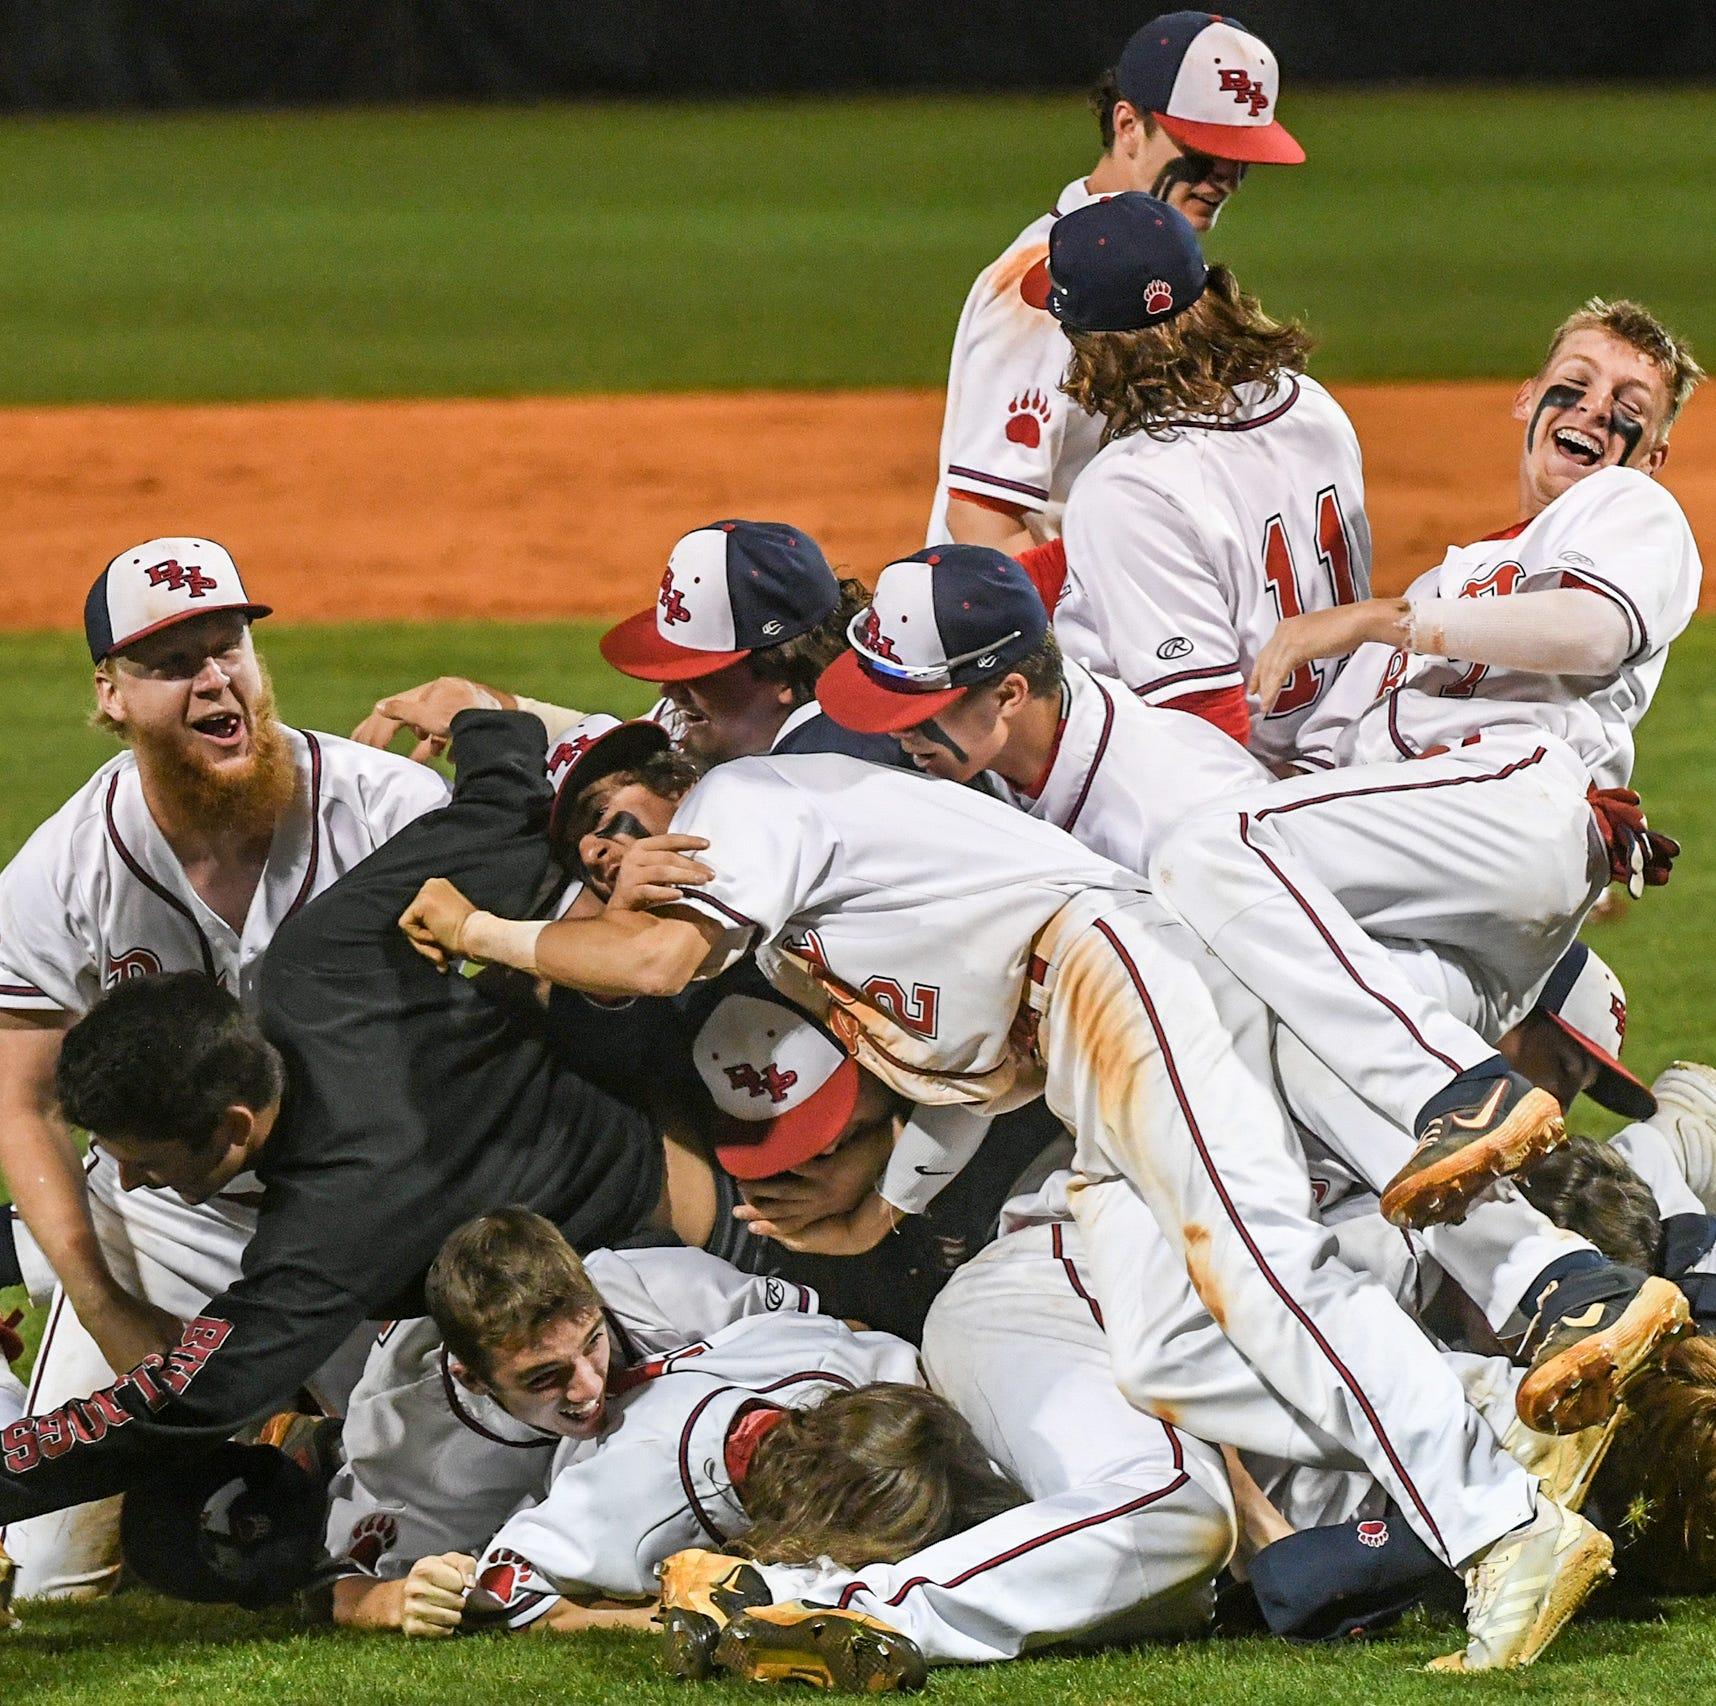 Belton-Honea Path tops Wren 7-5 to capture region baseball title